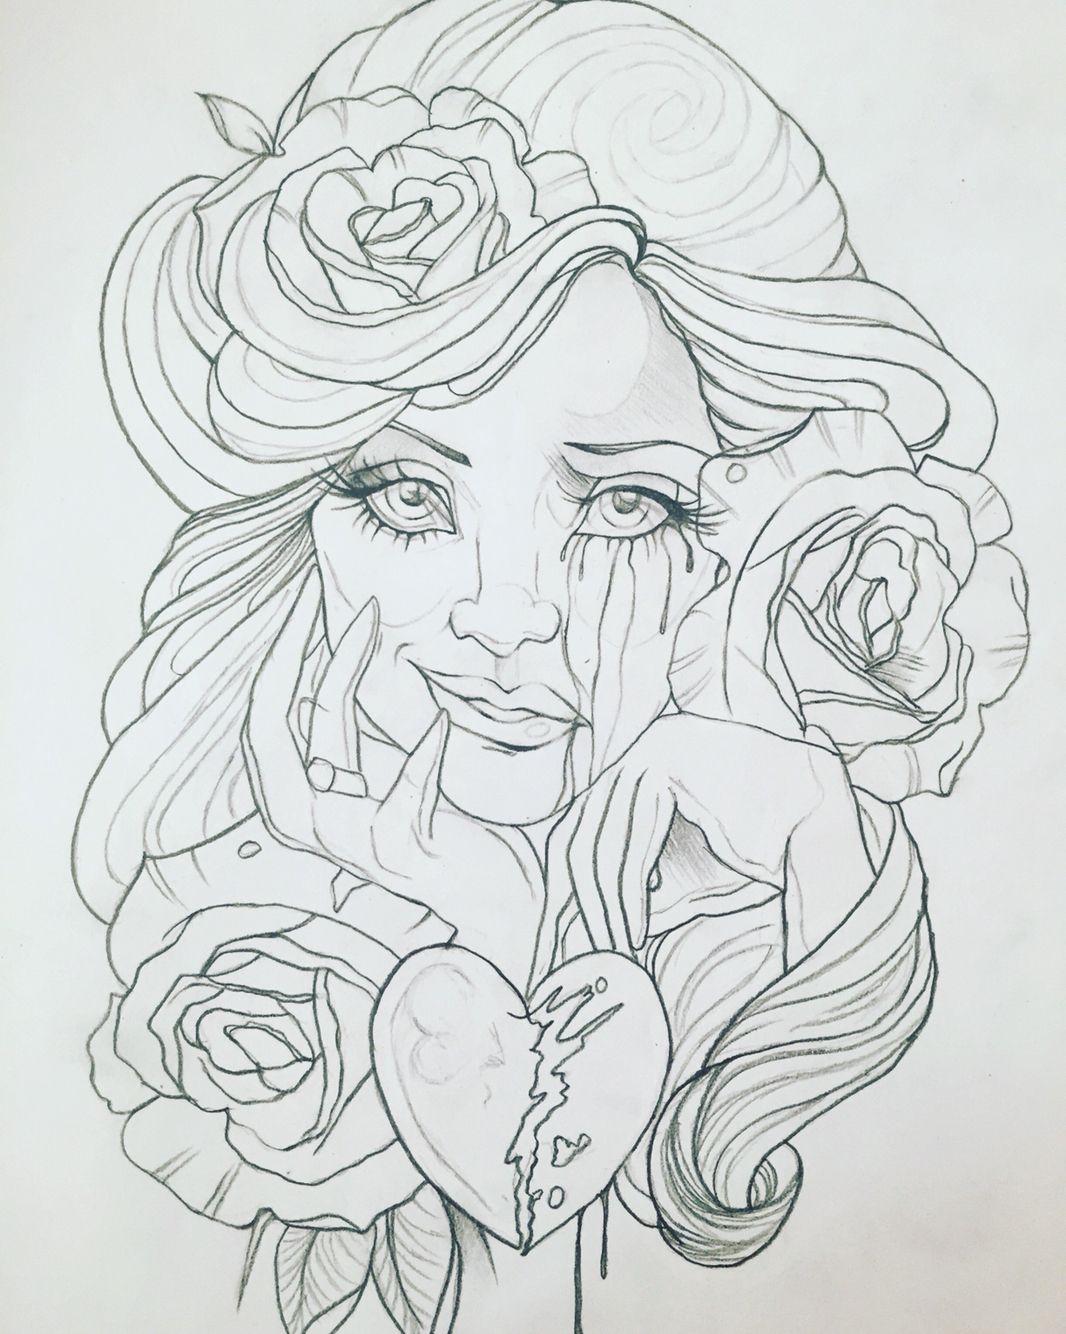 My drawing girl cute awesome sad crying happy brokenheart